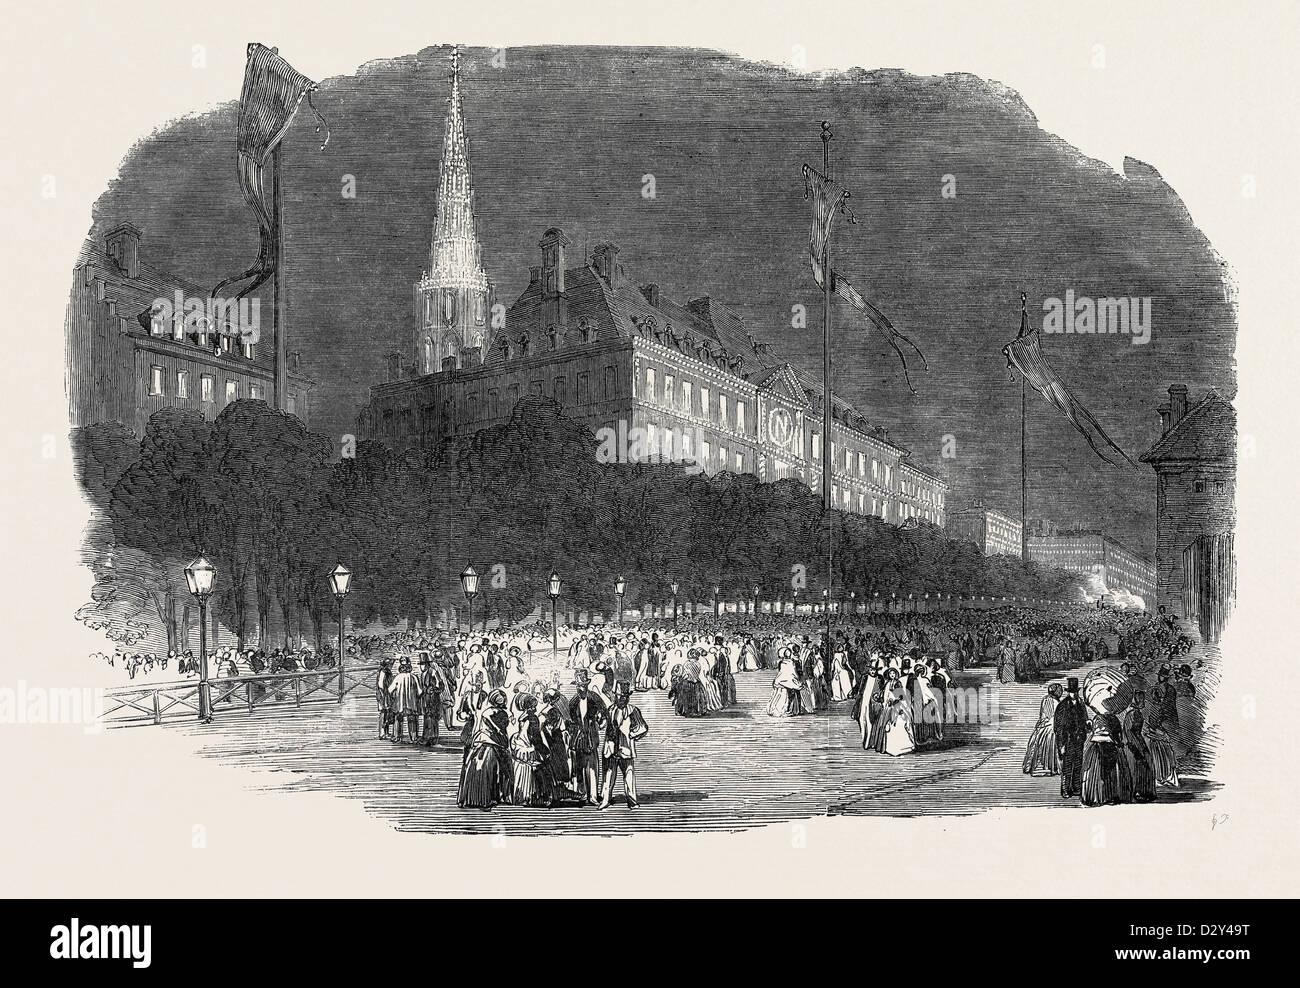 FETE AT STRASBOURG: THE ILLUMINATION AT STRASBOURG, 1852 - Stock Image